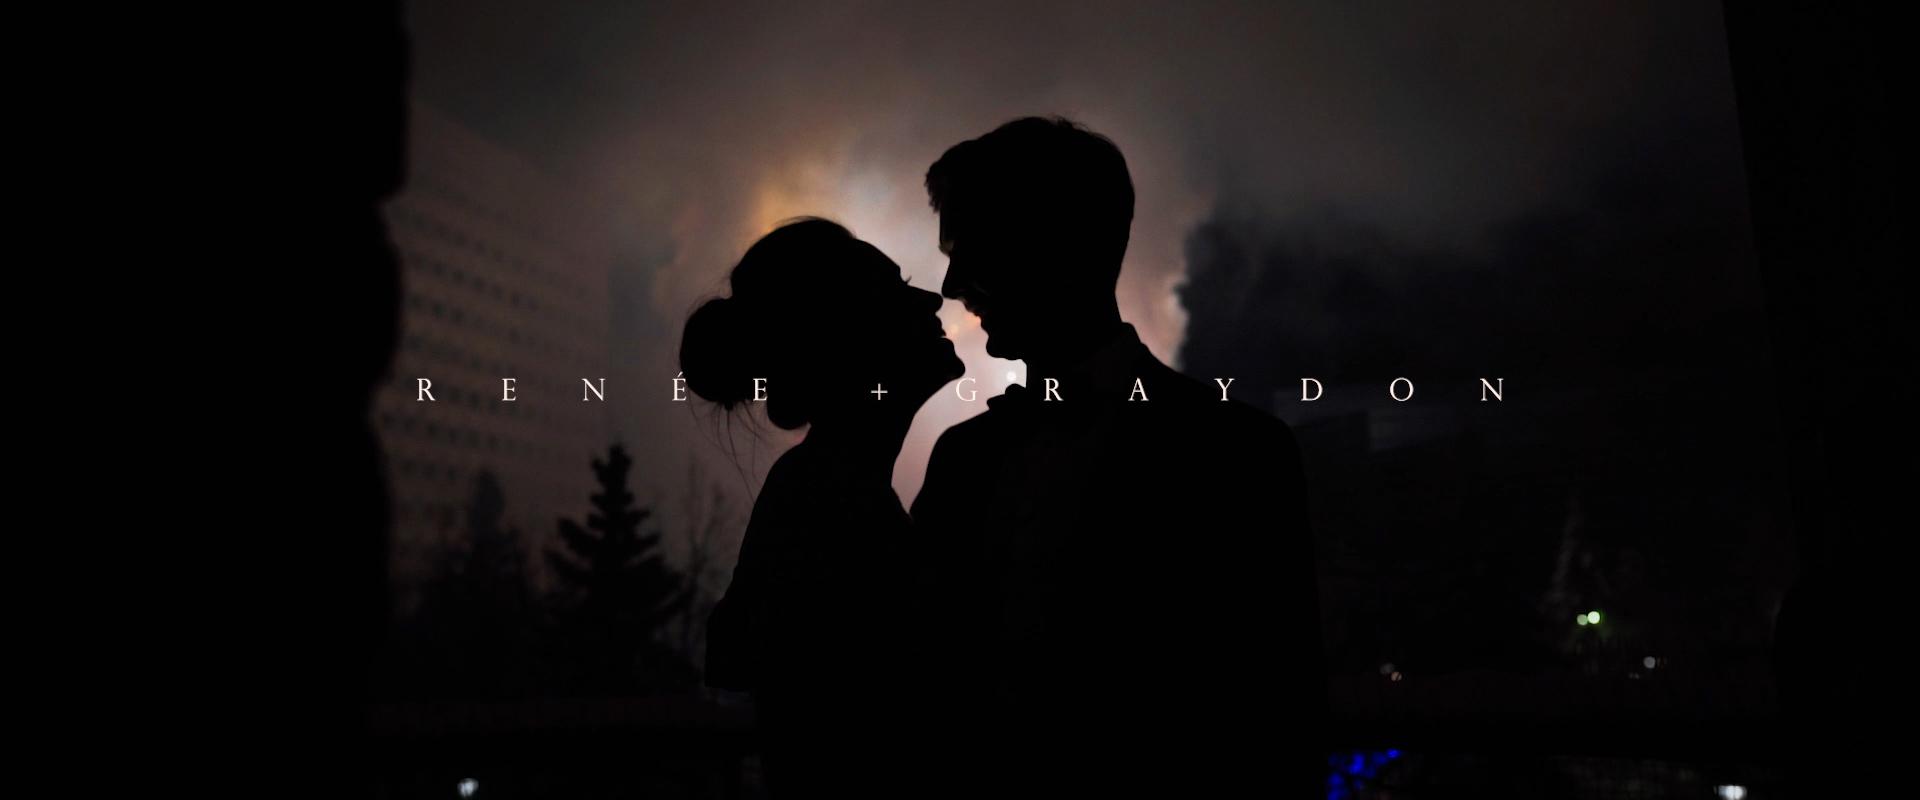 Renee + Graydon | Calgary, Canada | teatro